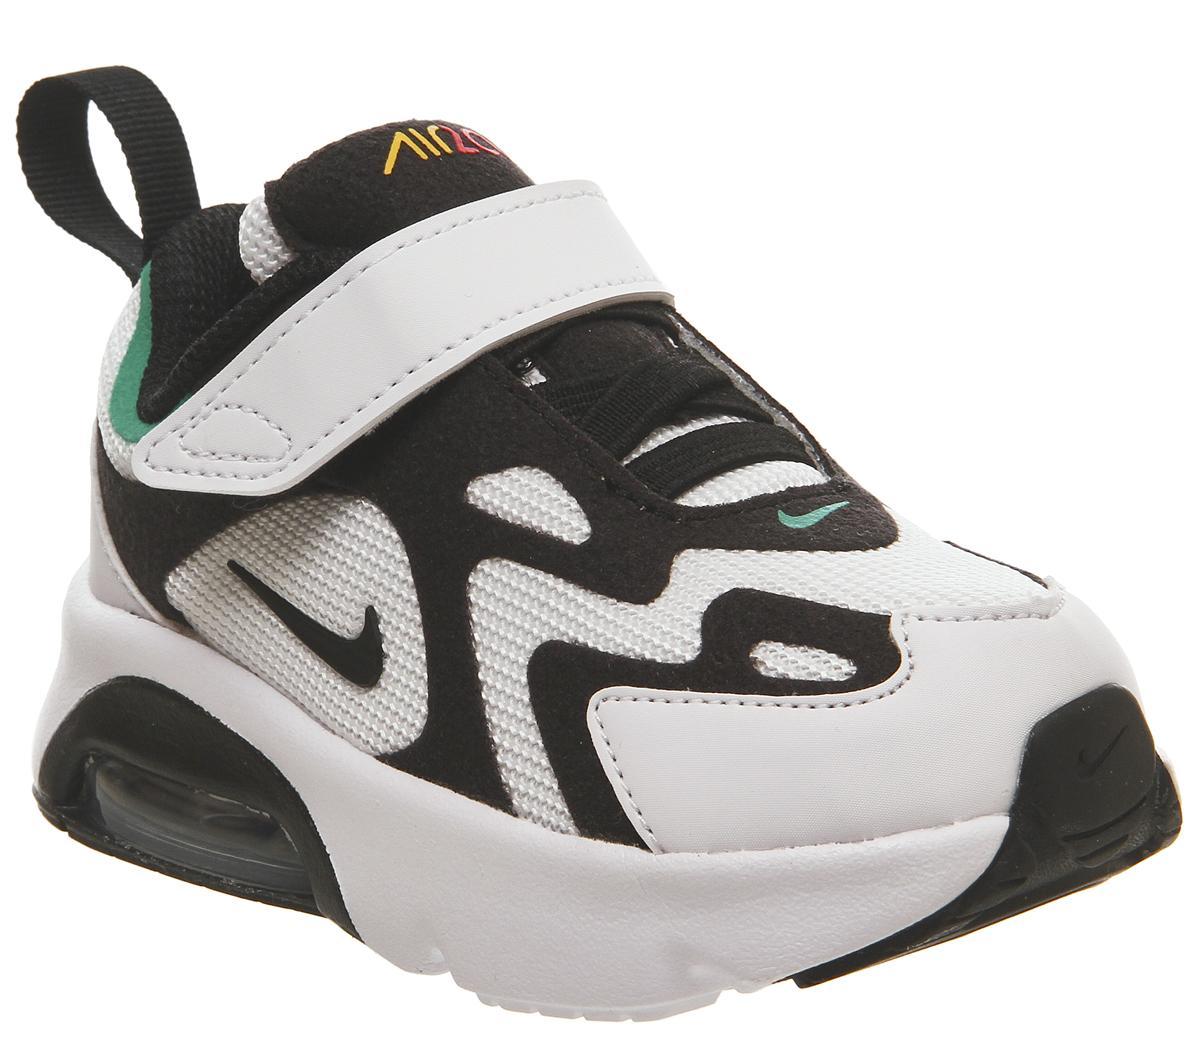 Nike Air Max 200 Sneakers WhiteBlackBright Crimson